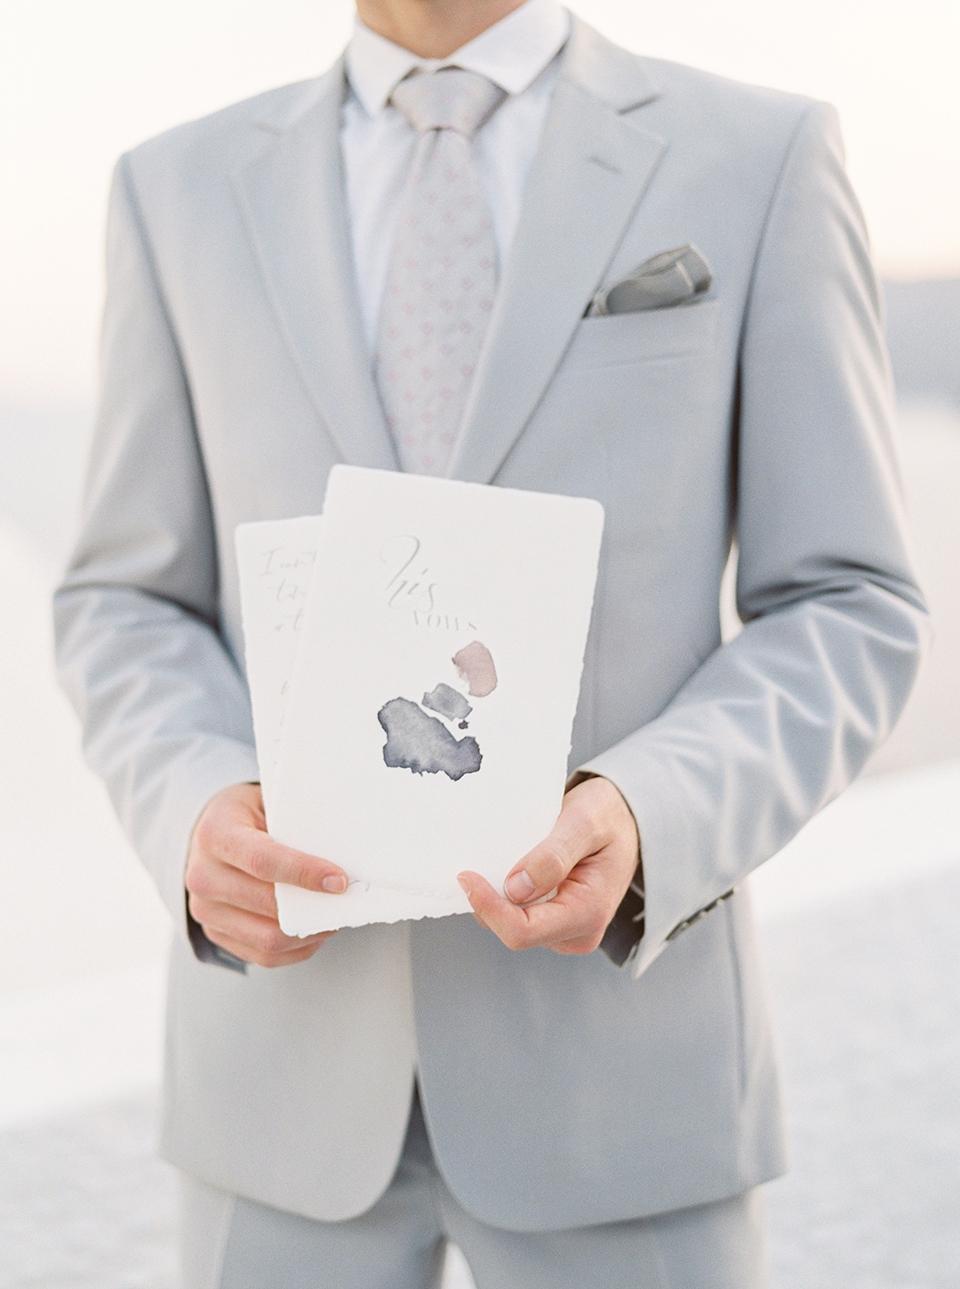 groom wedding vows for an elopement in santorini